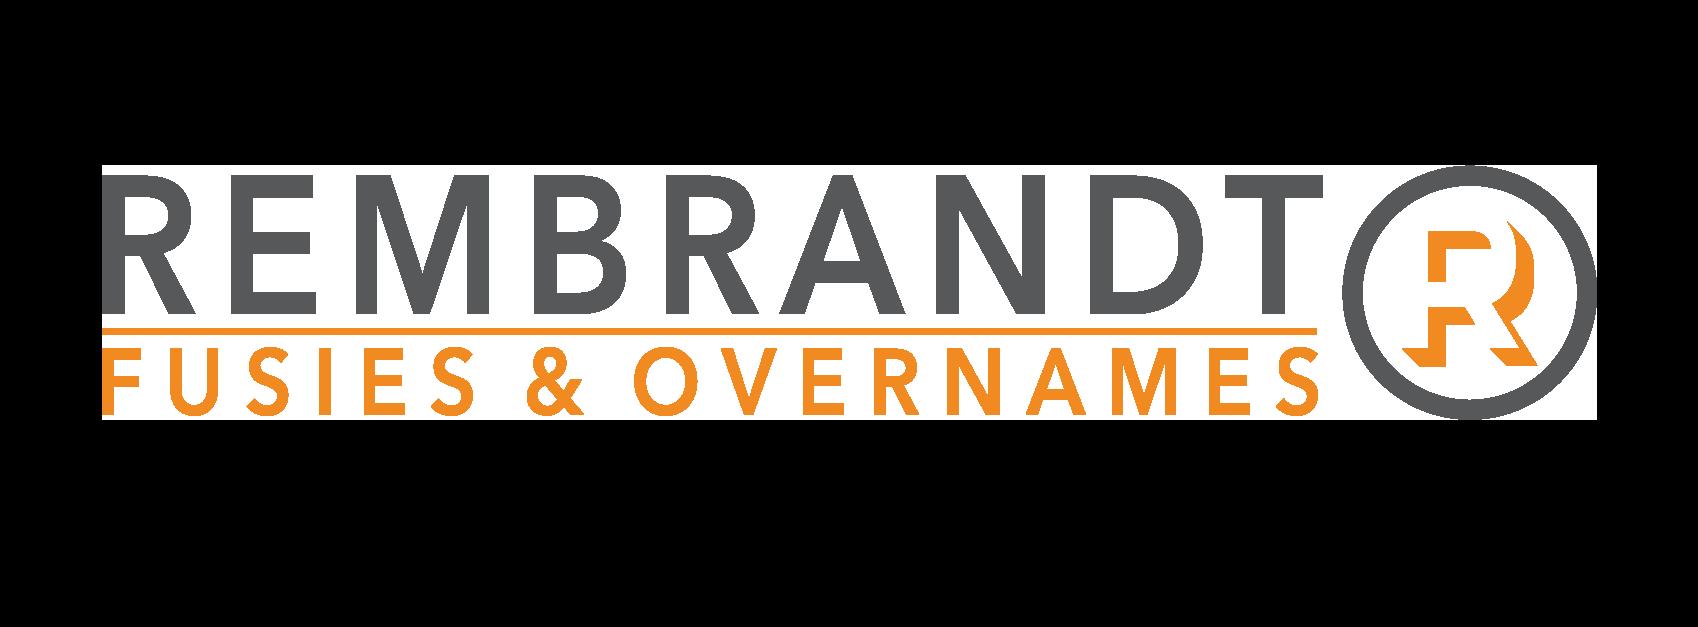 Rembrandt Fusies en Overnames logo